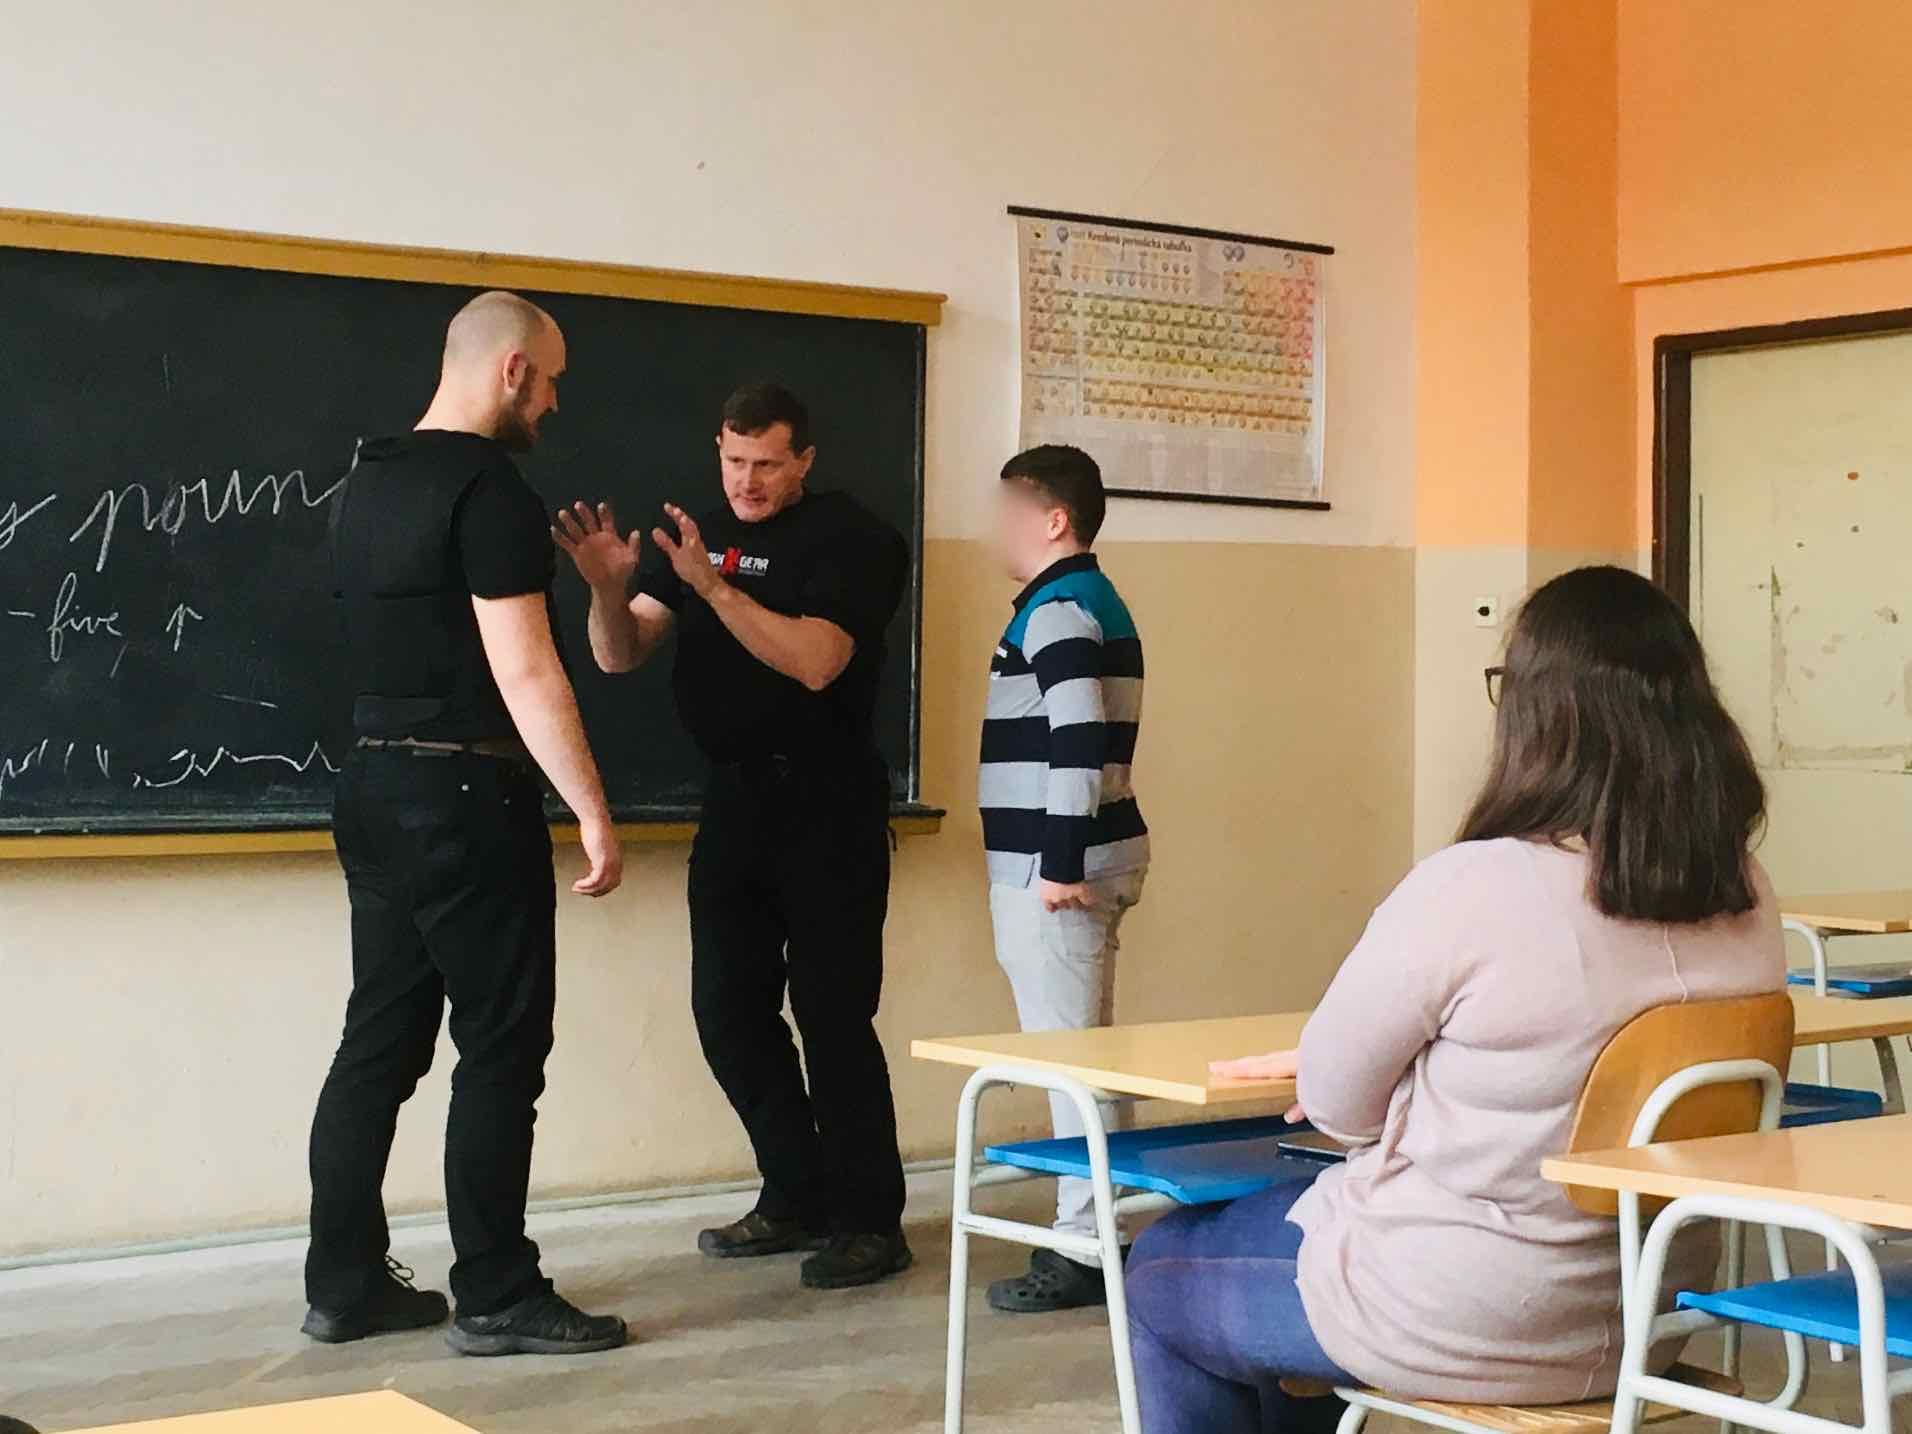 Realna_sebaobrana_Kosice_Gymnazium_Stefana_Moysesa_Moldava - 1 (1)